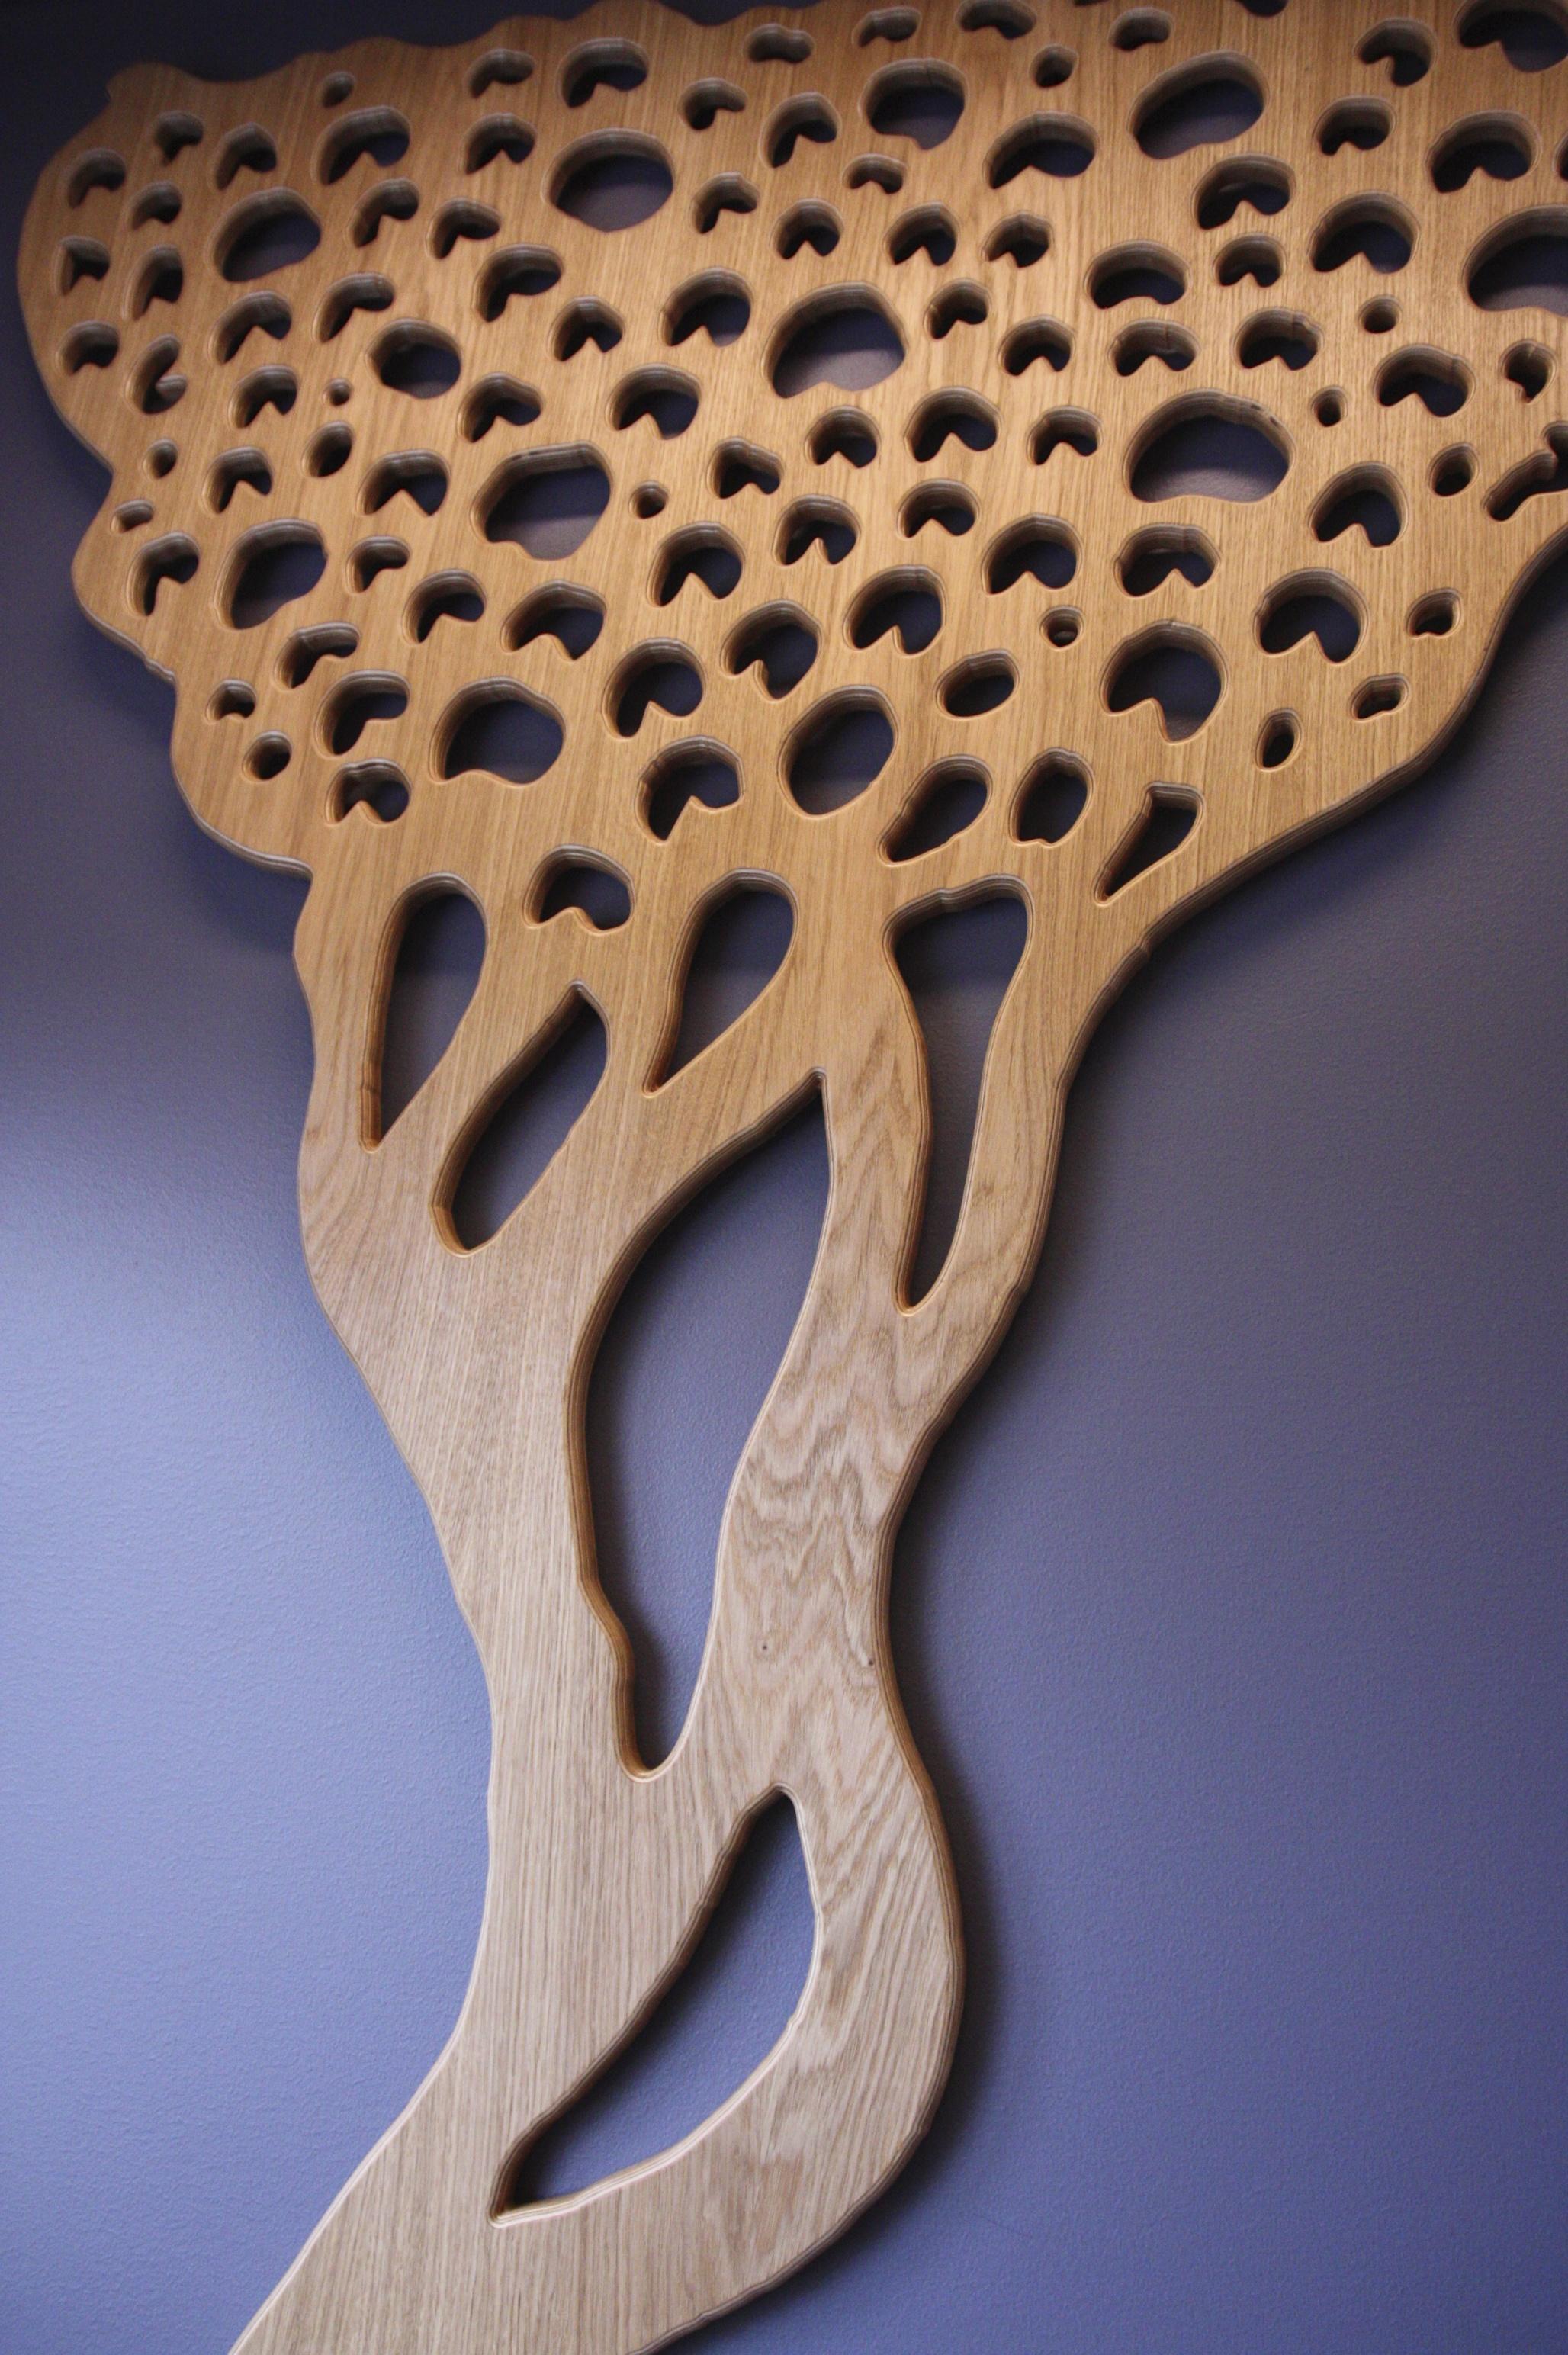 cnc-cut oak. 230x150cm